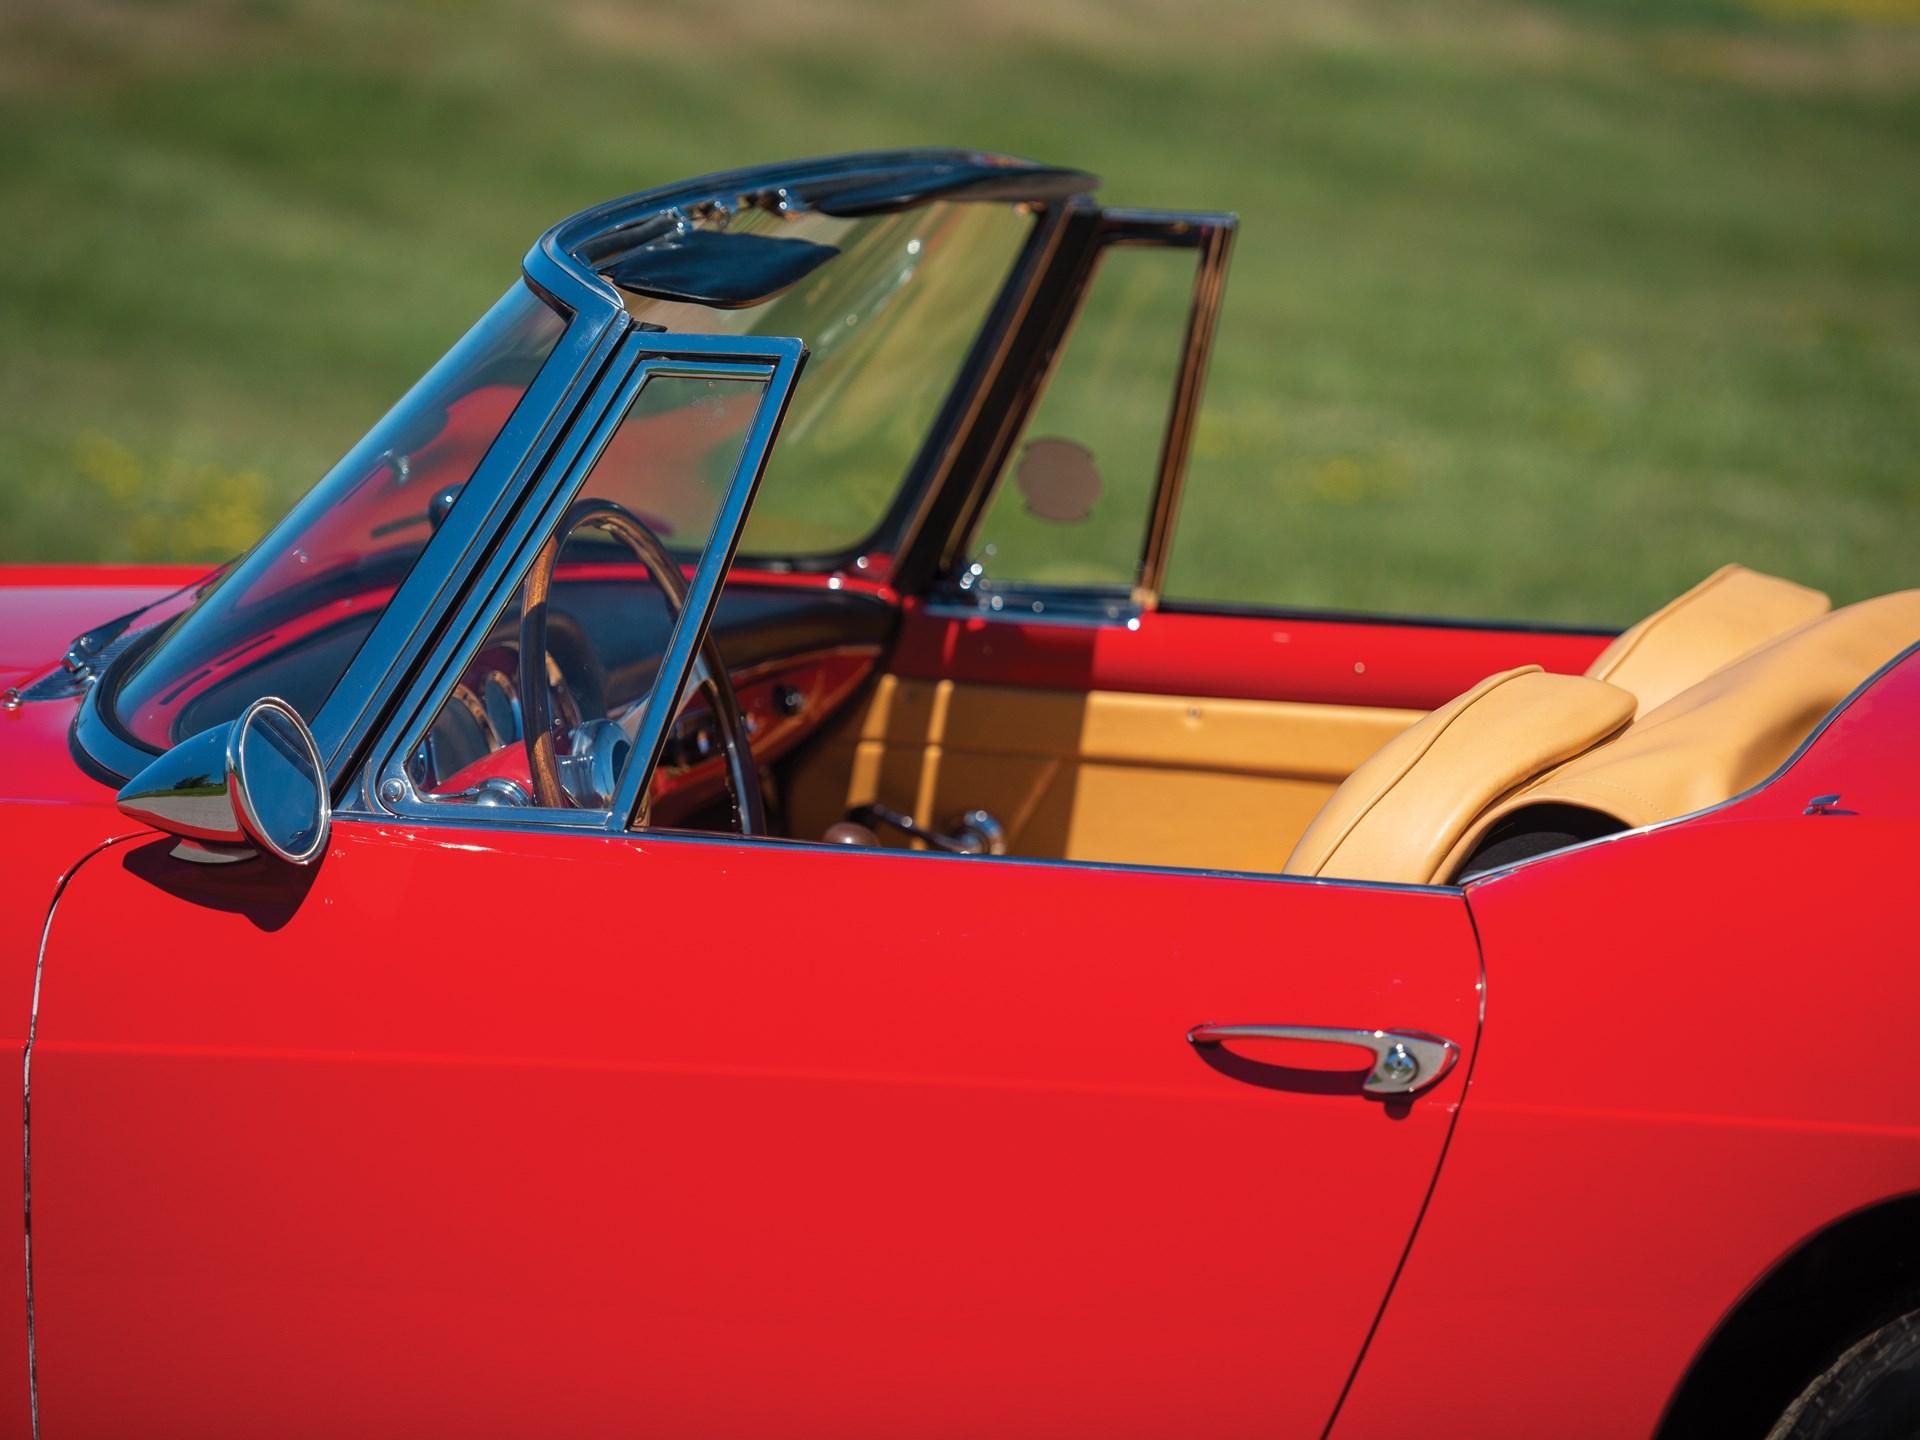 1960 Ferrari 250 GT Cabriolet Series II by Pinin Farina